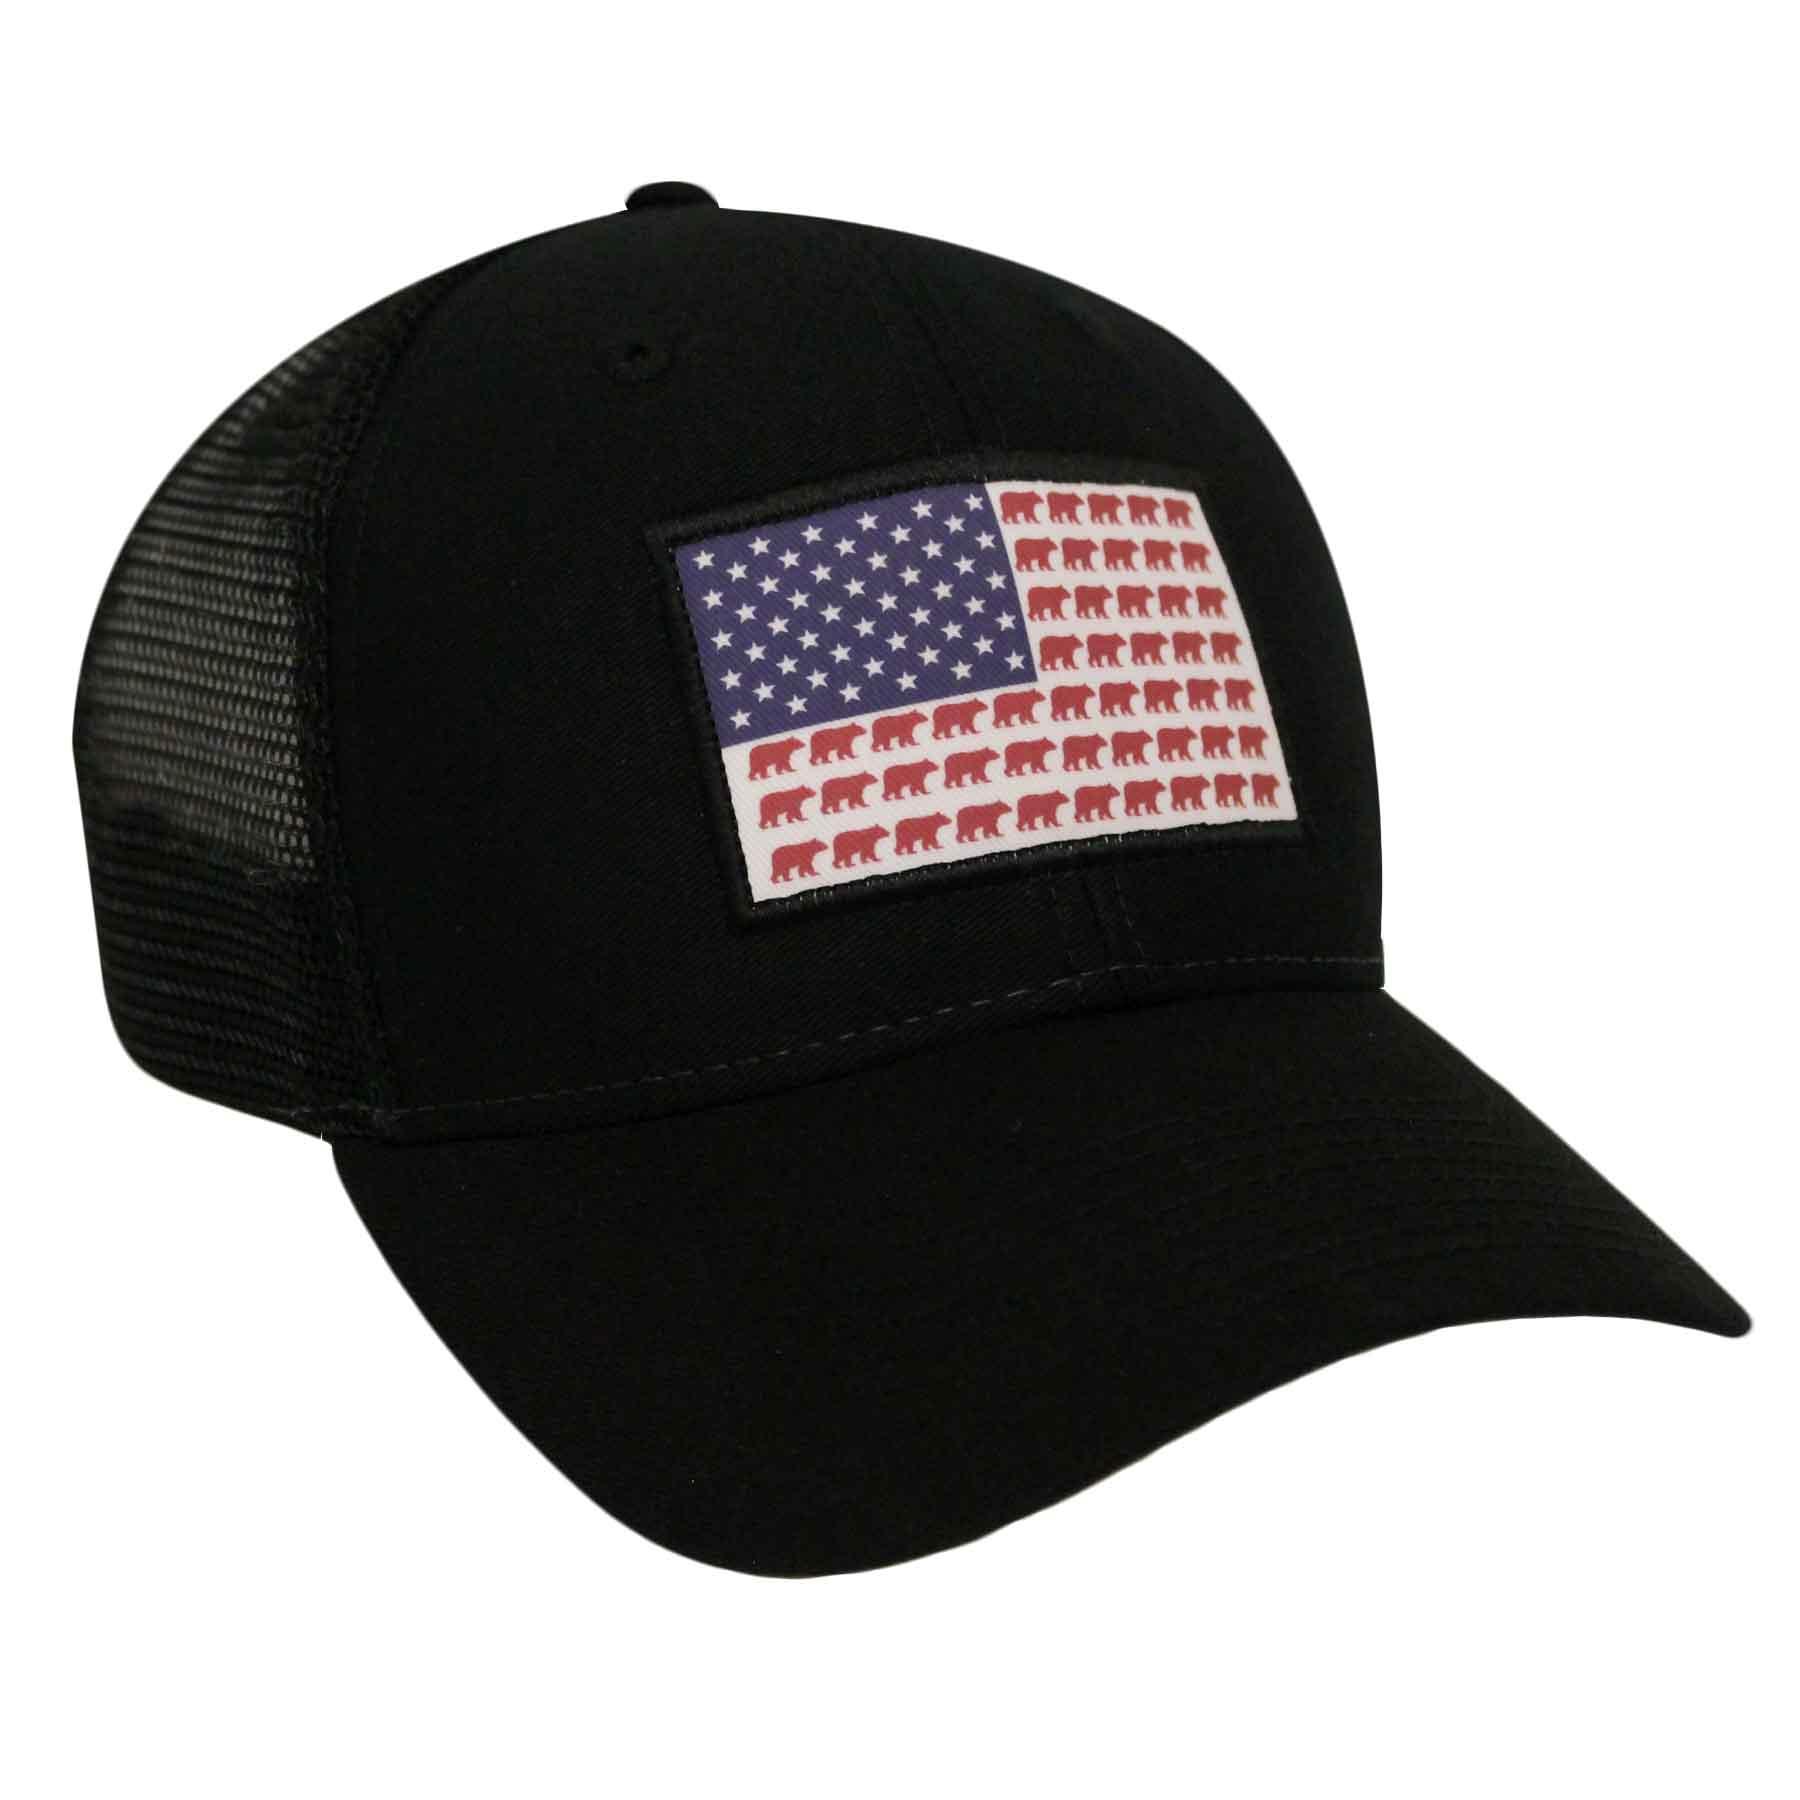 Soft Mesh Sideline Cap